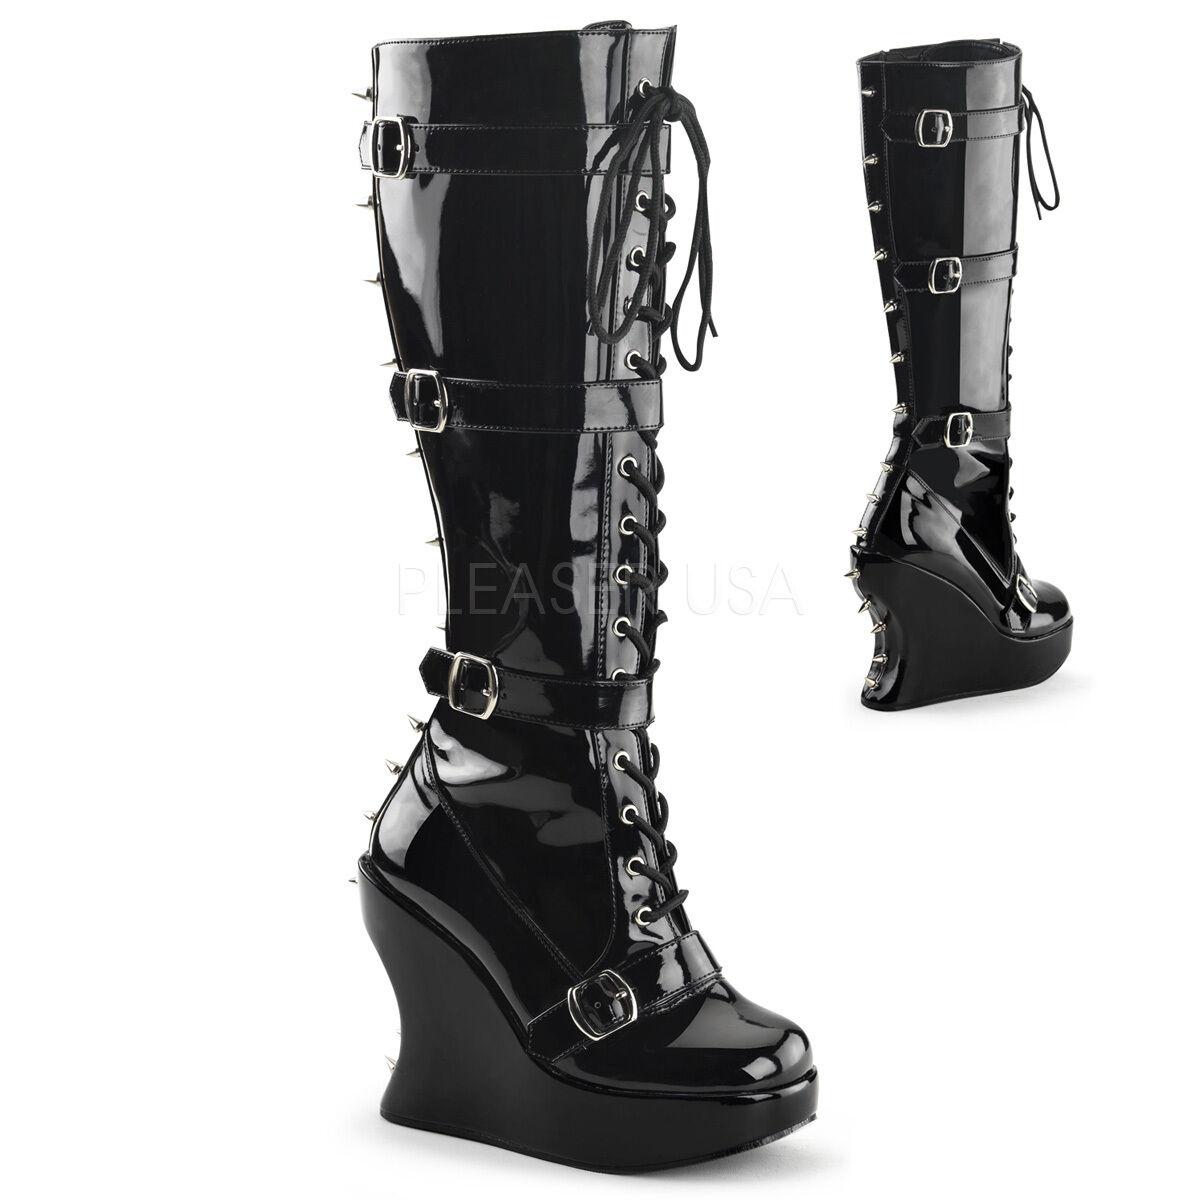 Demonia Bravo-108 Ladies Goth Punk Boots Buckle Straps Featuring Spikes Vegan